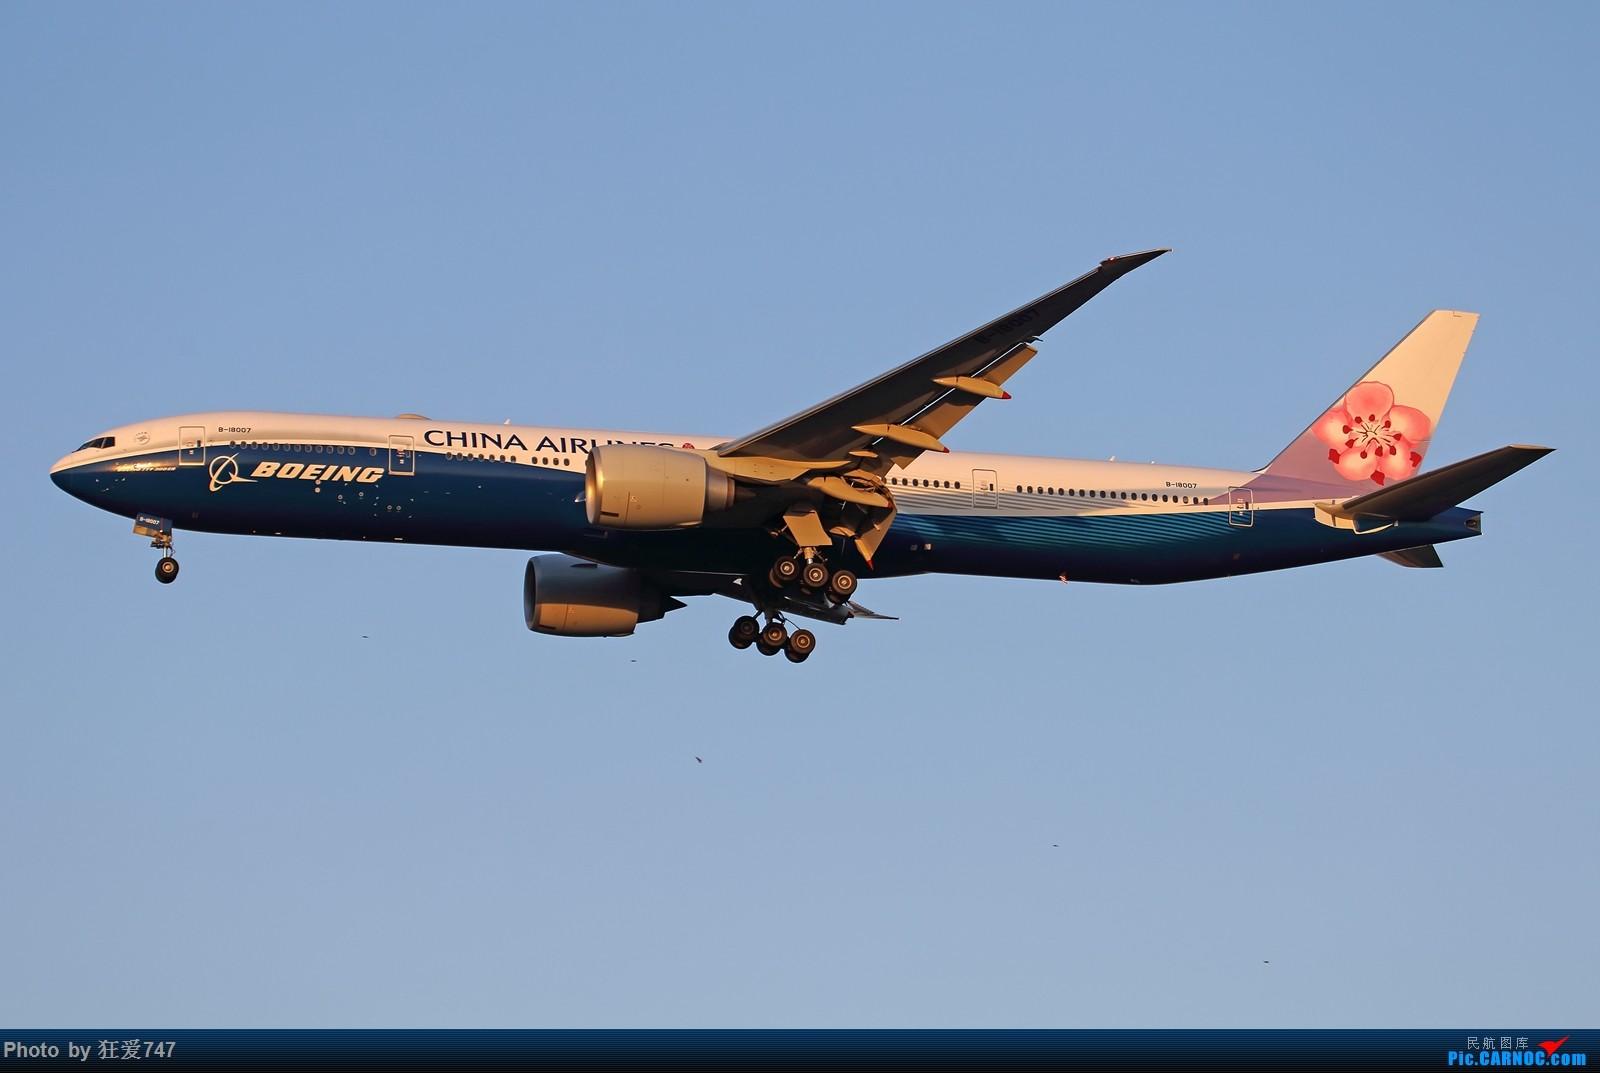 Re:[原创]沙尘暴过后北京天空进入蓝天白云模式 BOEING 777-300ER B-18007 中国北京首都国际机场